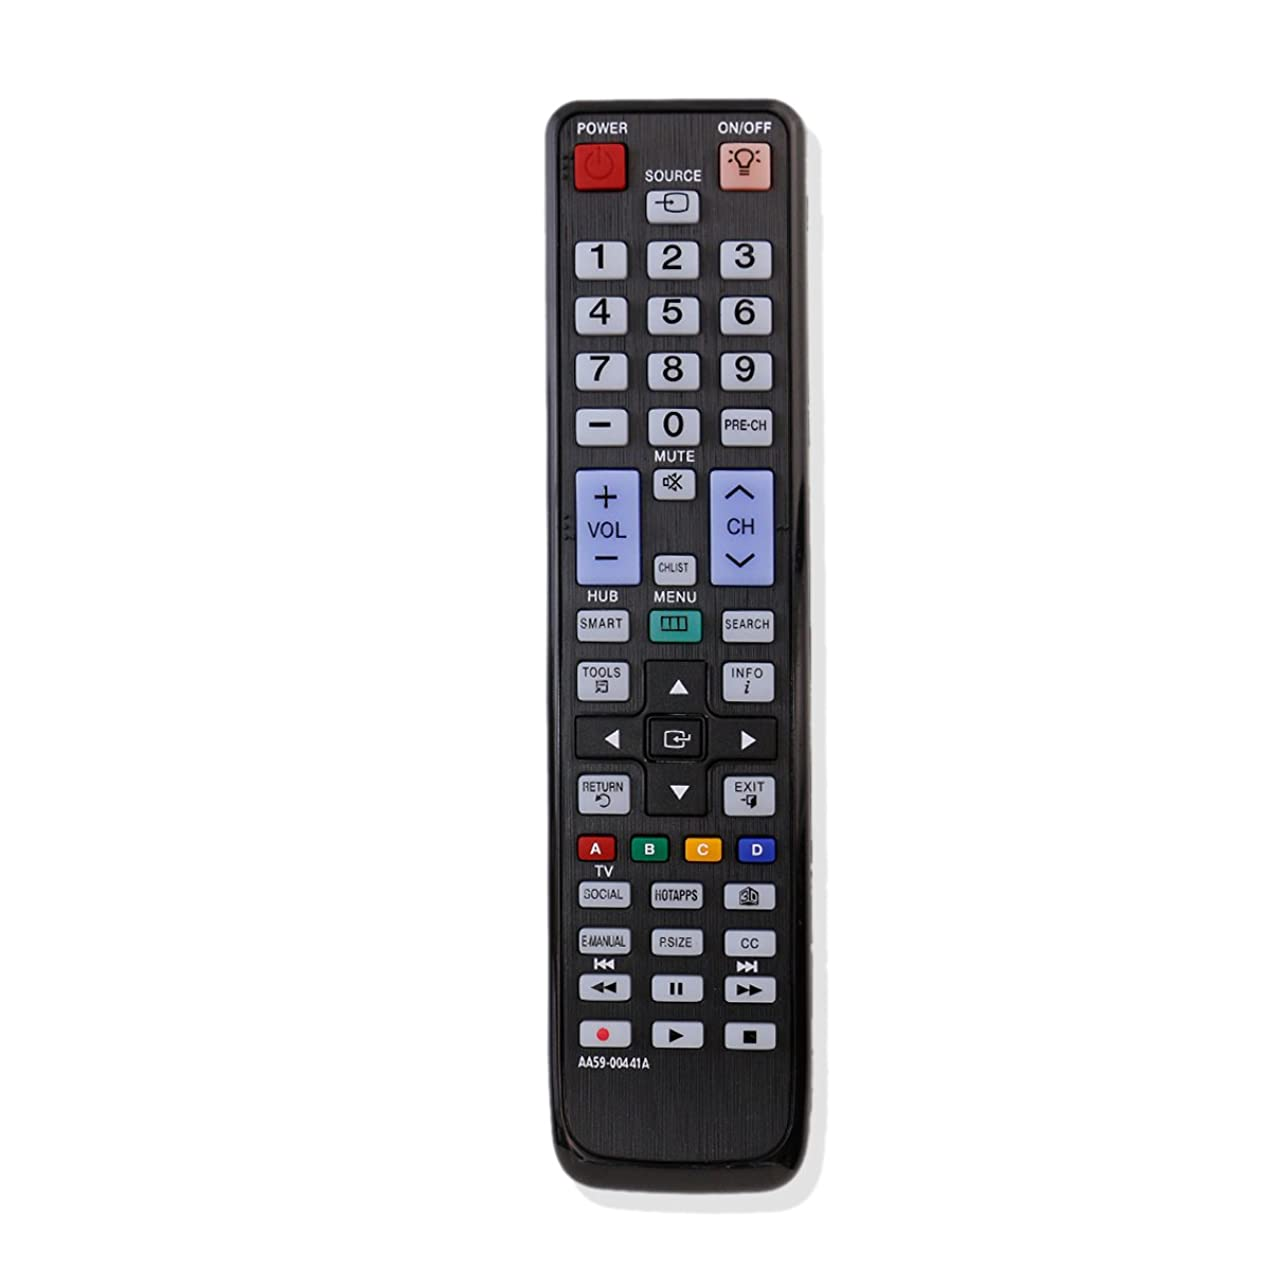 ZdalaMit AA59-00441A Replaced Remote Control Fit for Samsung LCD LED HDTV TV UN60D6420UFXZA UN55D6420UF UN46D6420UF UN46D6420UFXZA UN46D6420UFXZC UN55D6420UFXZA UN55D6420UFXZC